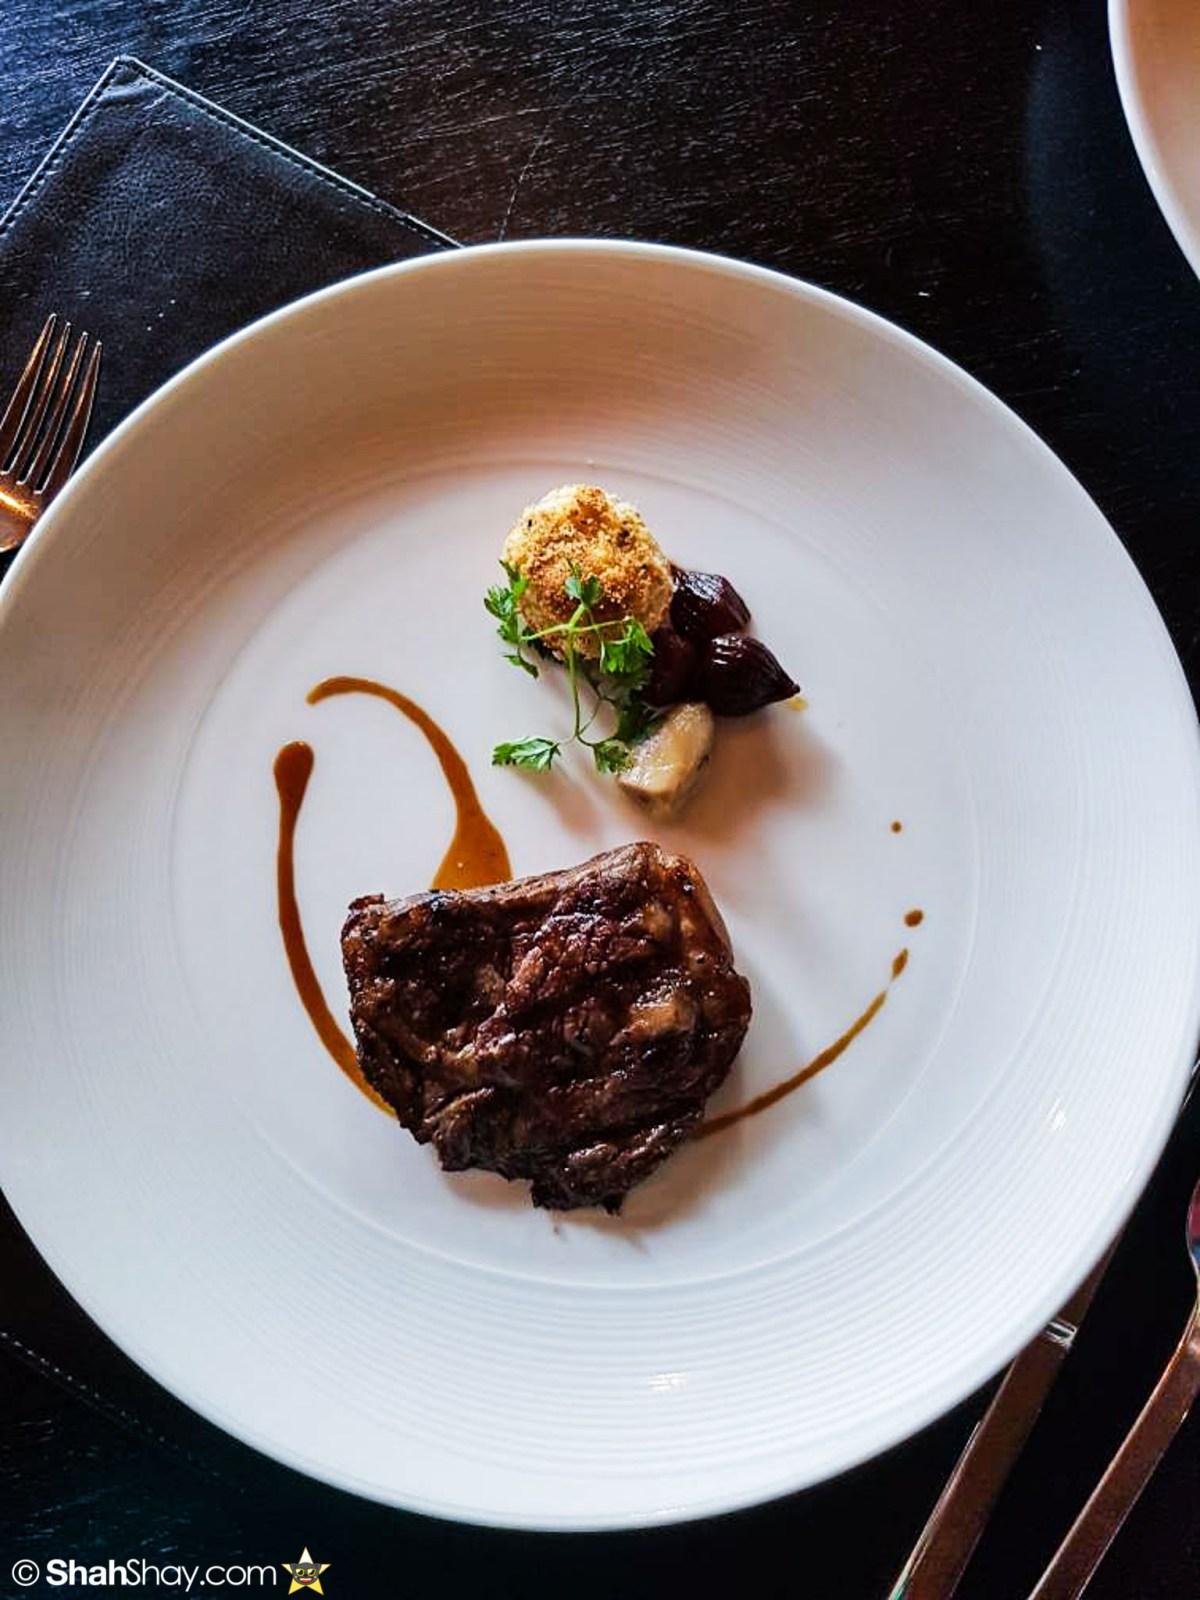 Sunday Brunch Bangkok - Fabulous Brunch Buffet Spread at The District - Wagyu striploin steak